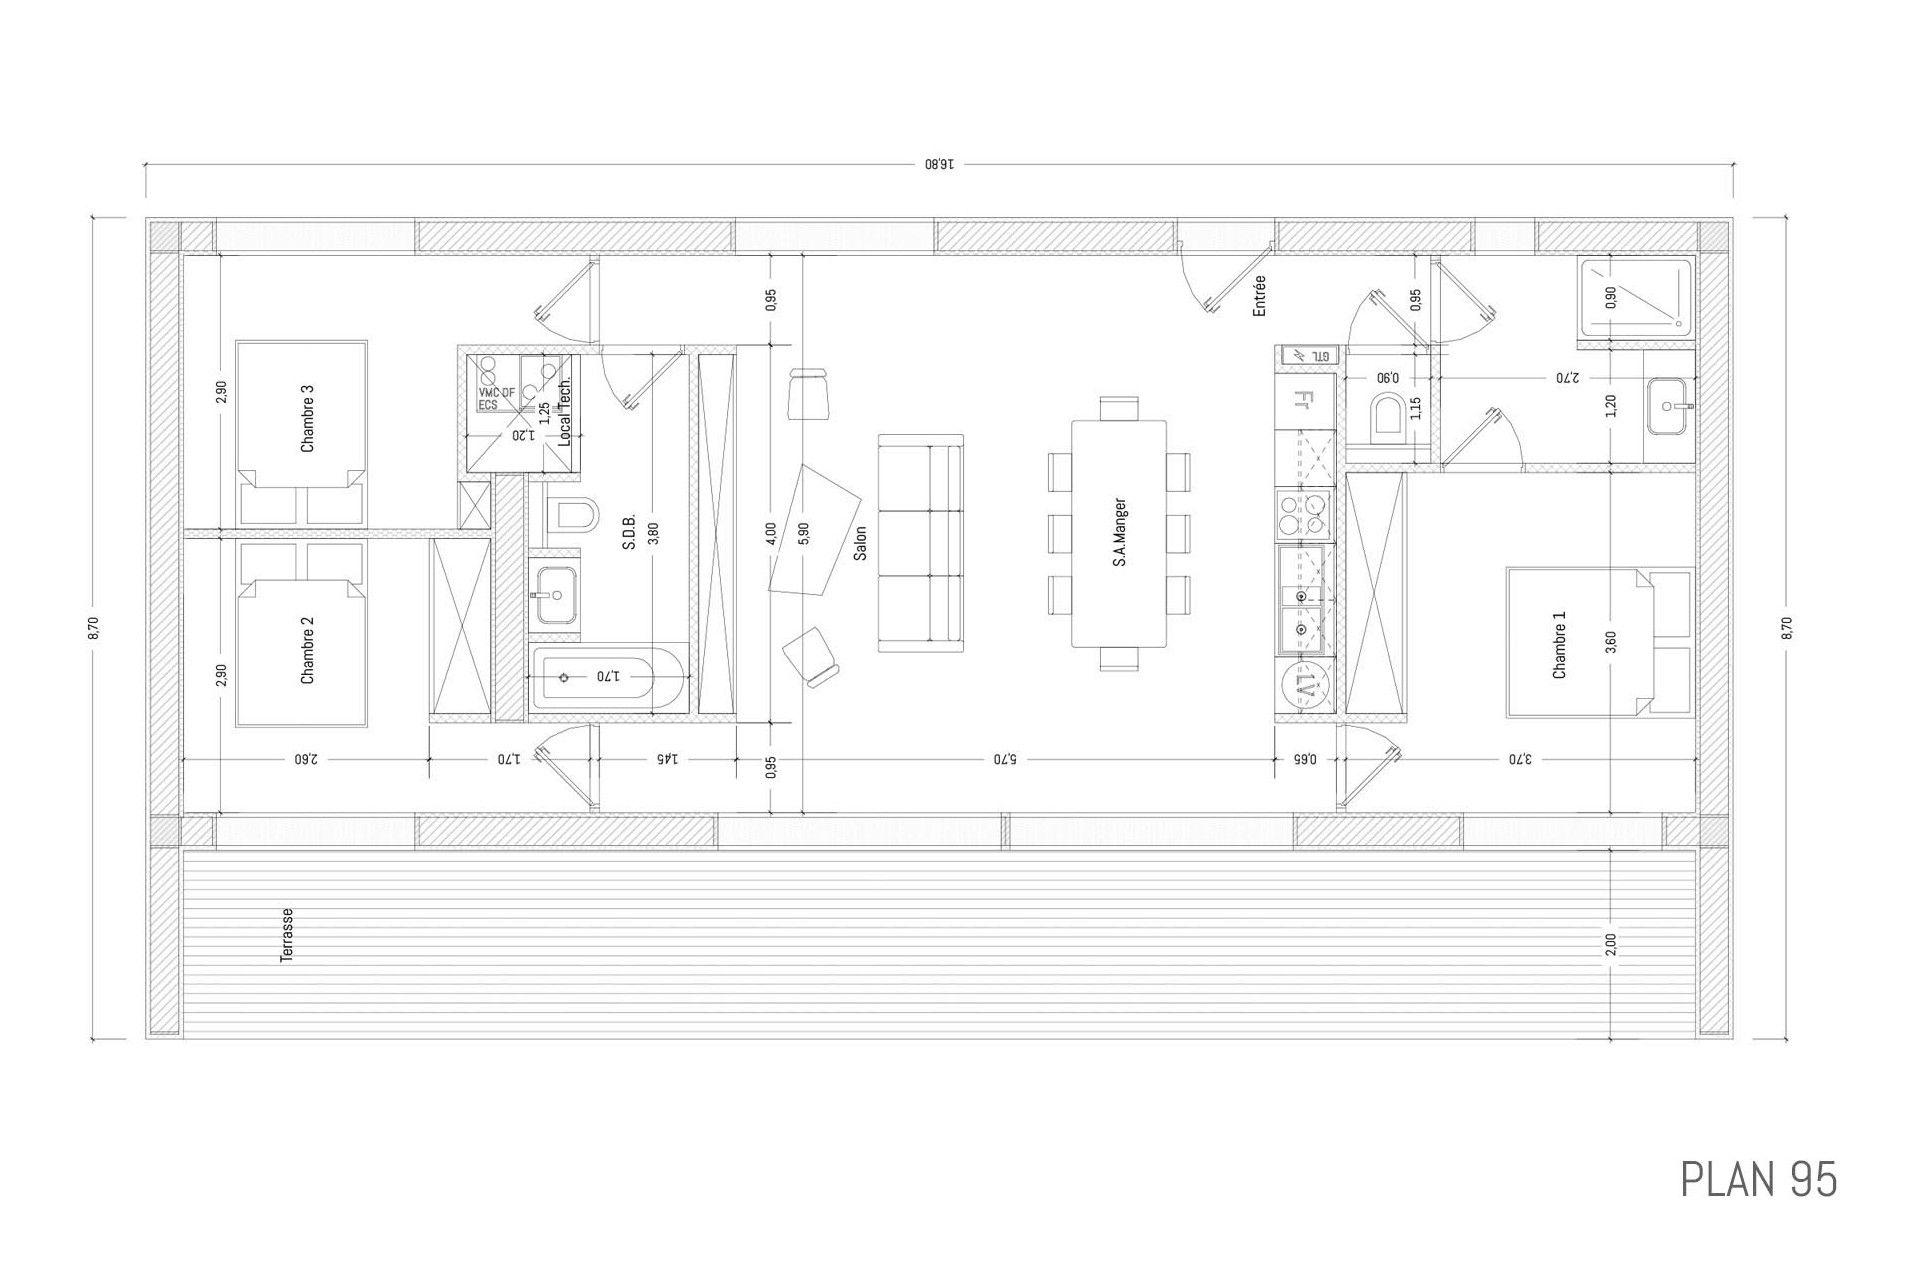 Collection Maisons Popup House Modele Pure Boat Building Plans